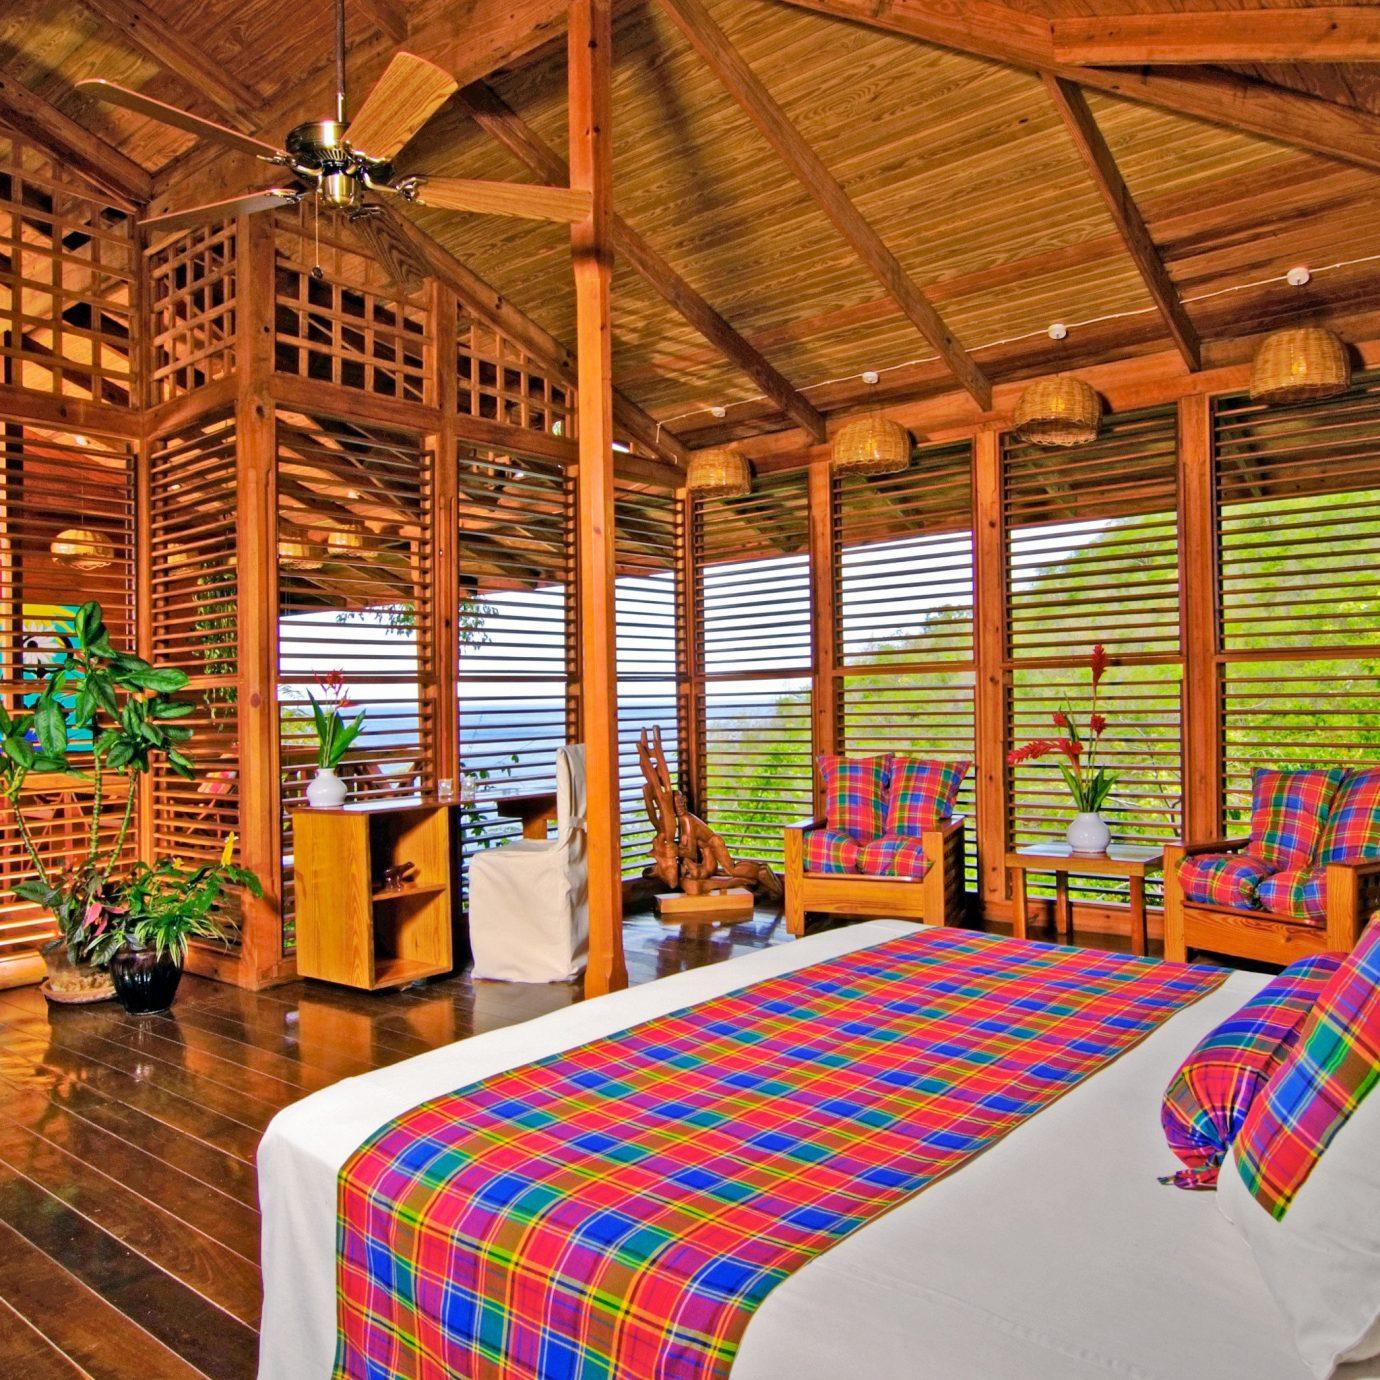 Beach Beachfront Family Island Luxury Suite chair leisure Resort amusement park eco hotel colorful